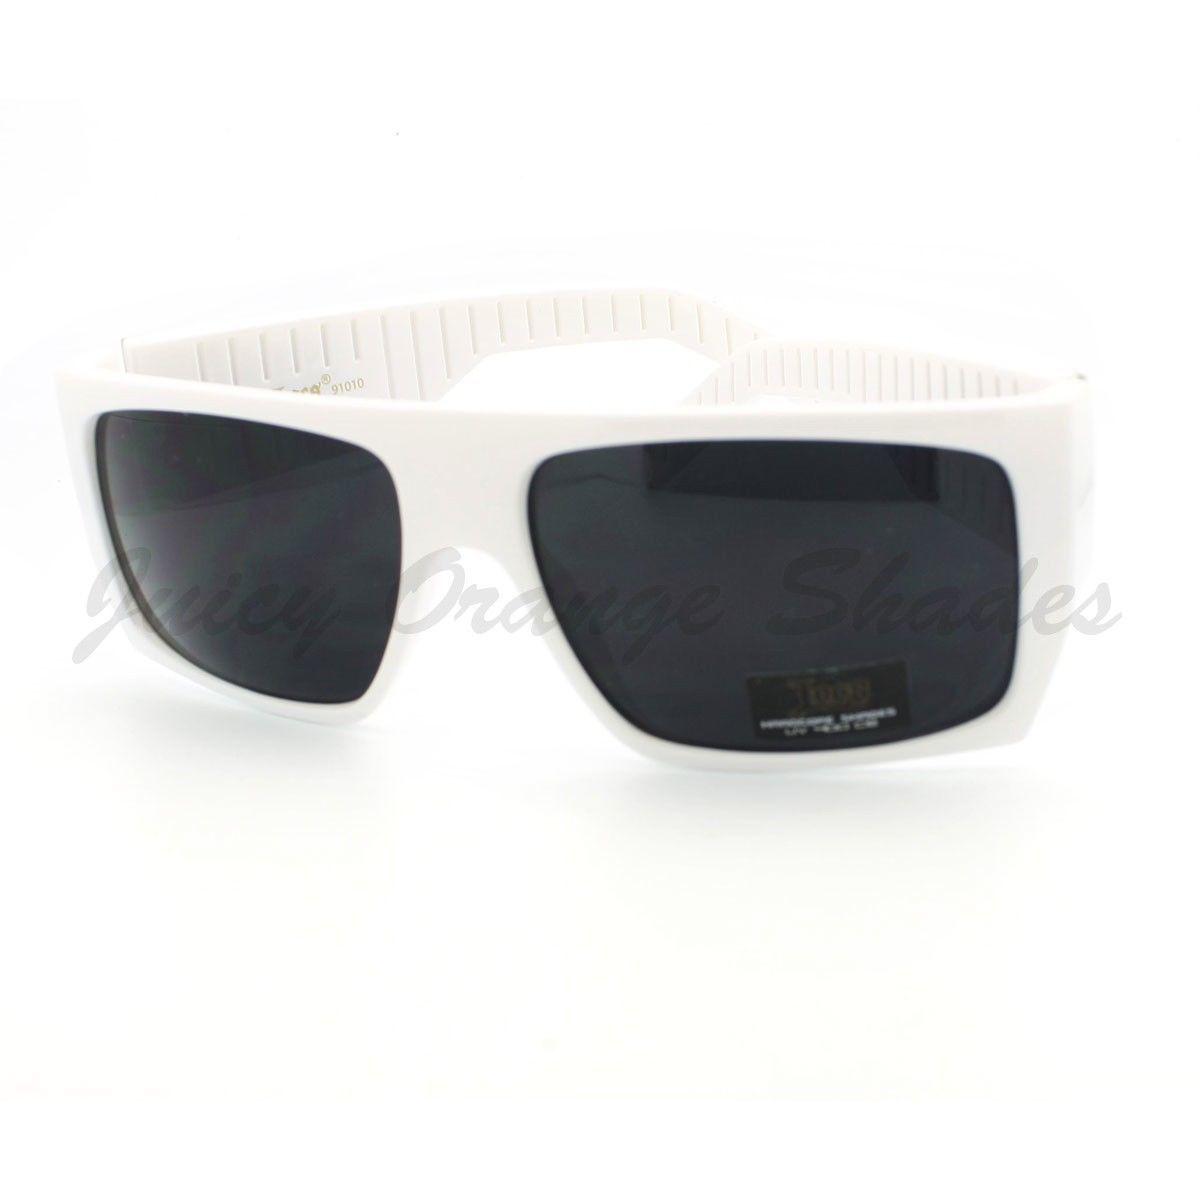 186ccd871b0 Locs Sunglasses Mens Flat Top Square Gangster Mob Fashion Shades